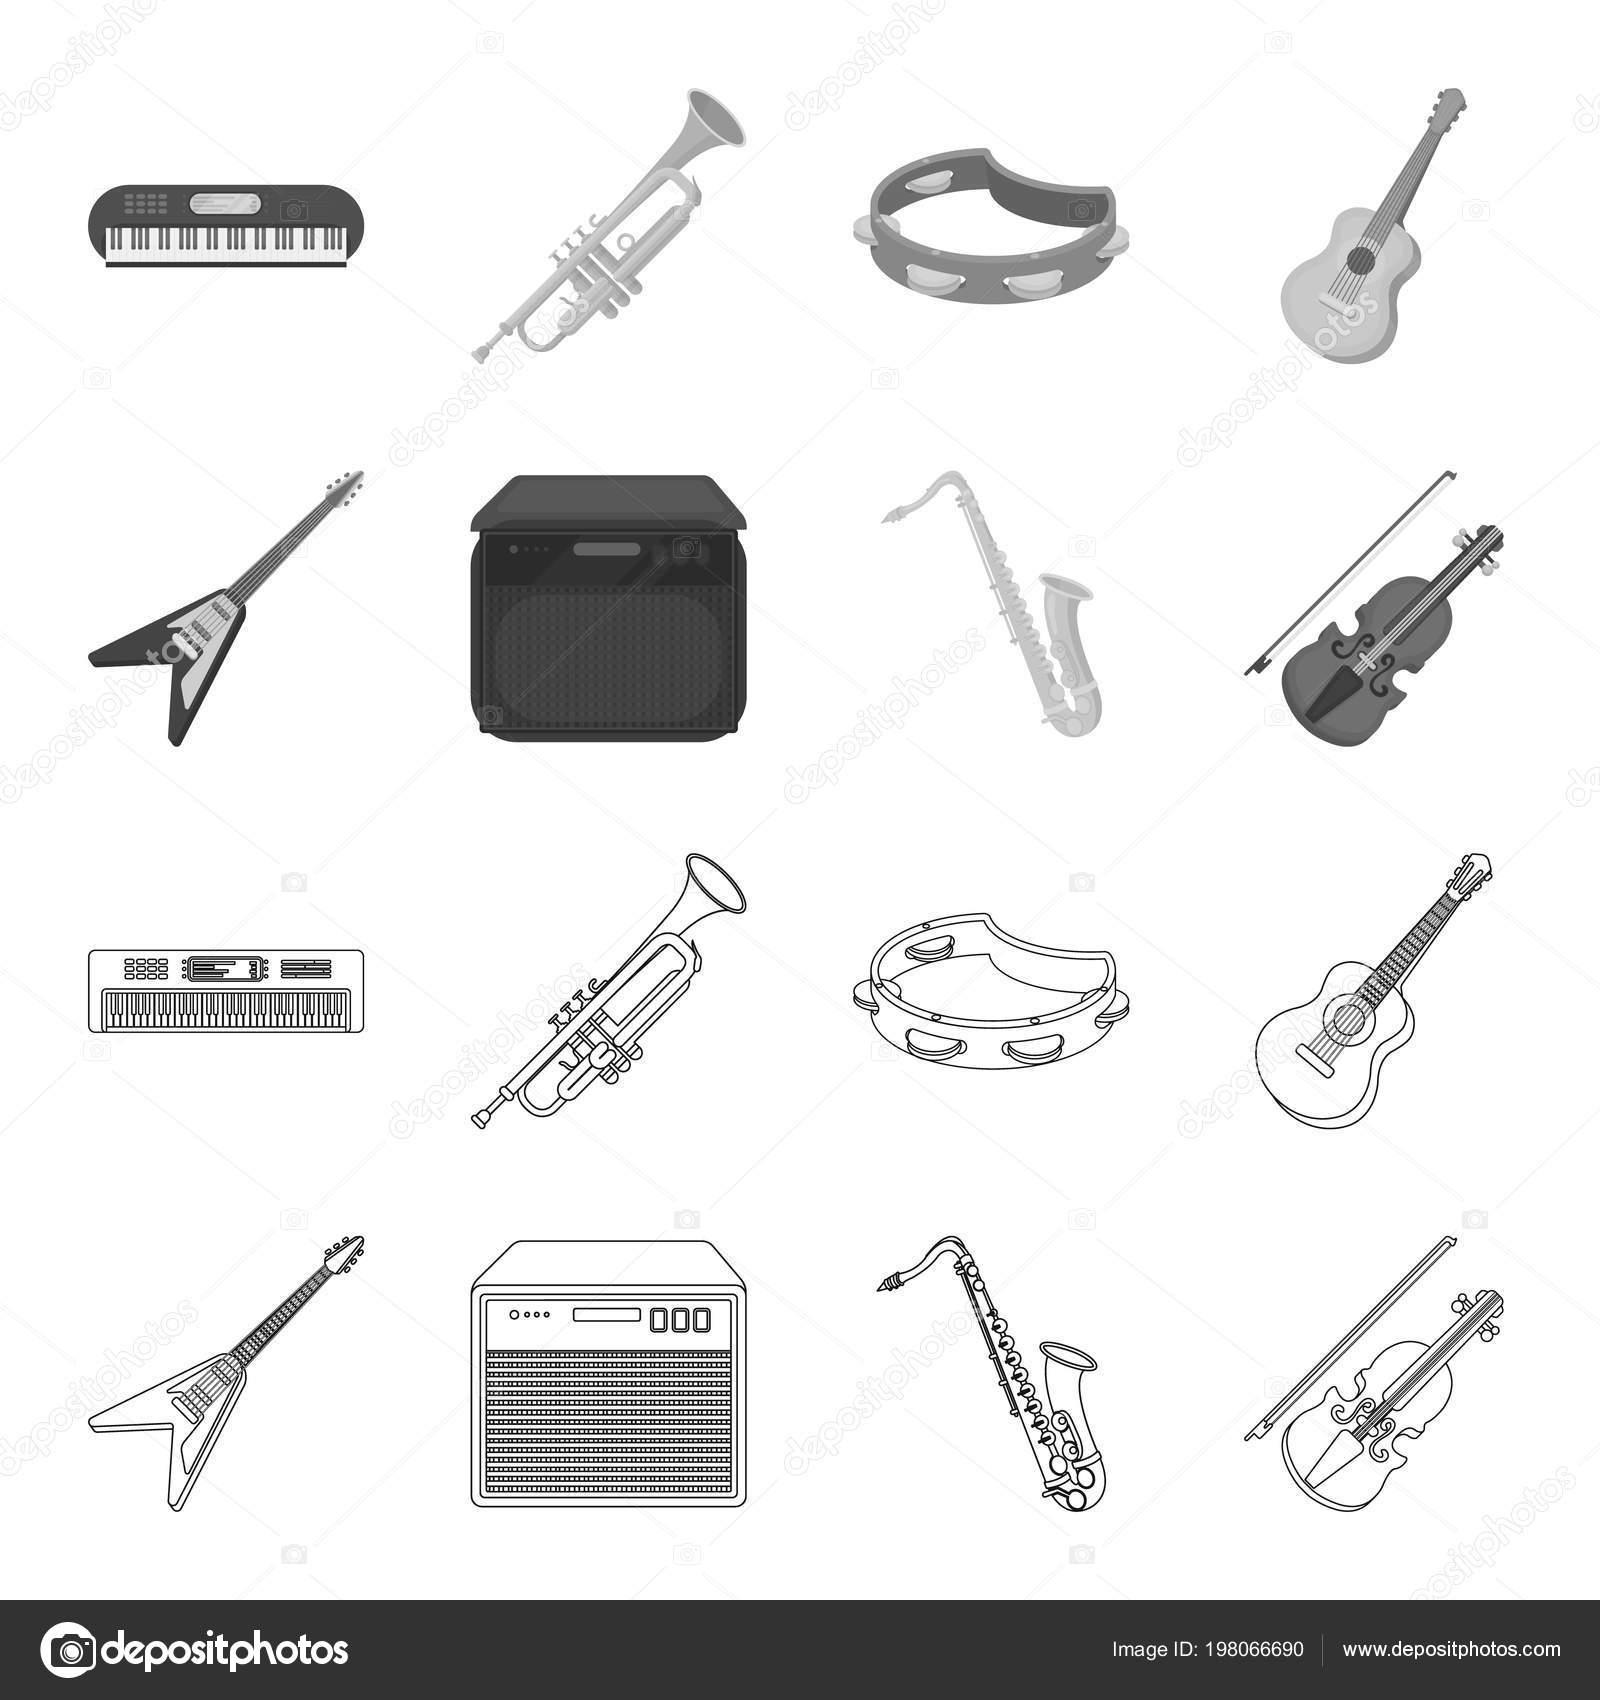 Electric Guitar Loudspeaker Saxophone Violinsic Instruments